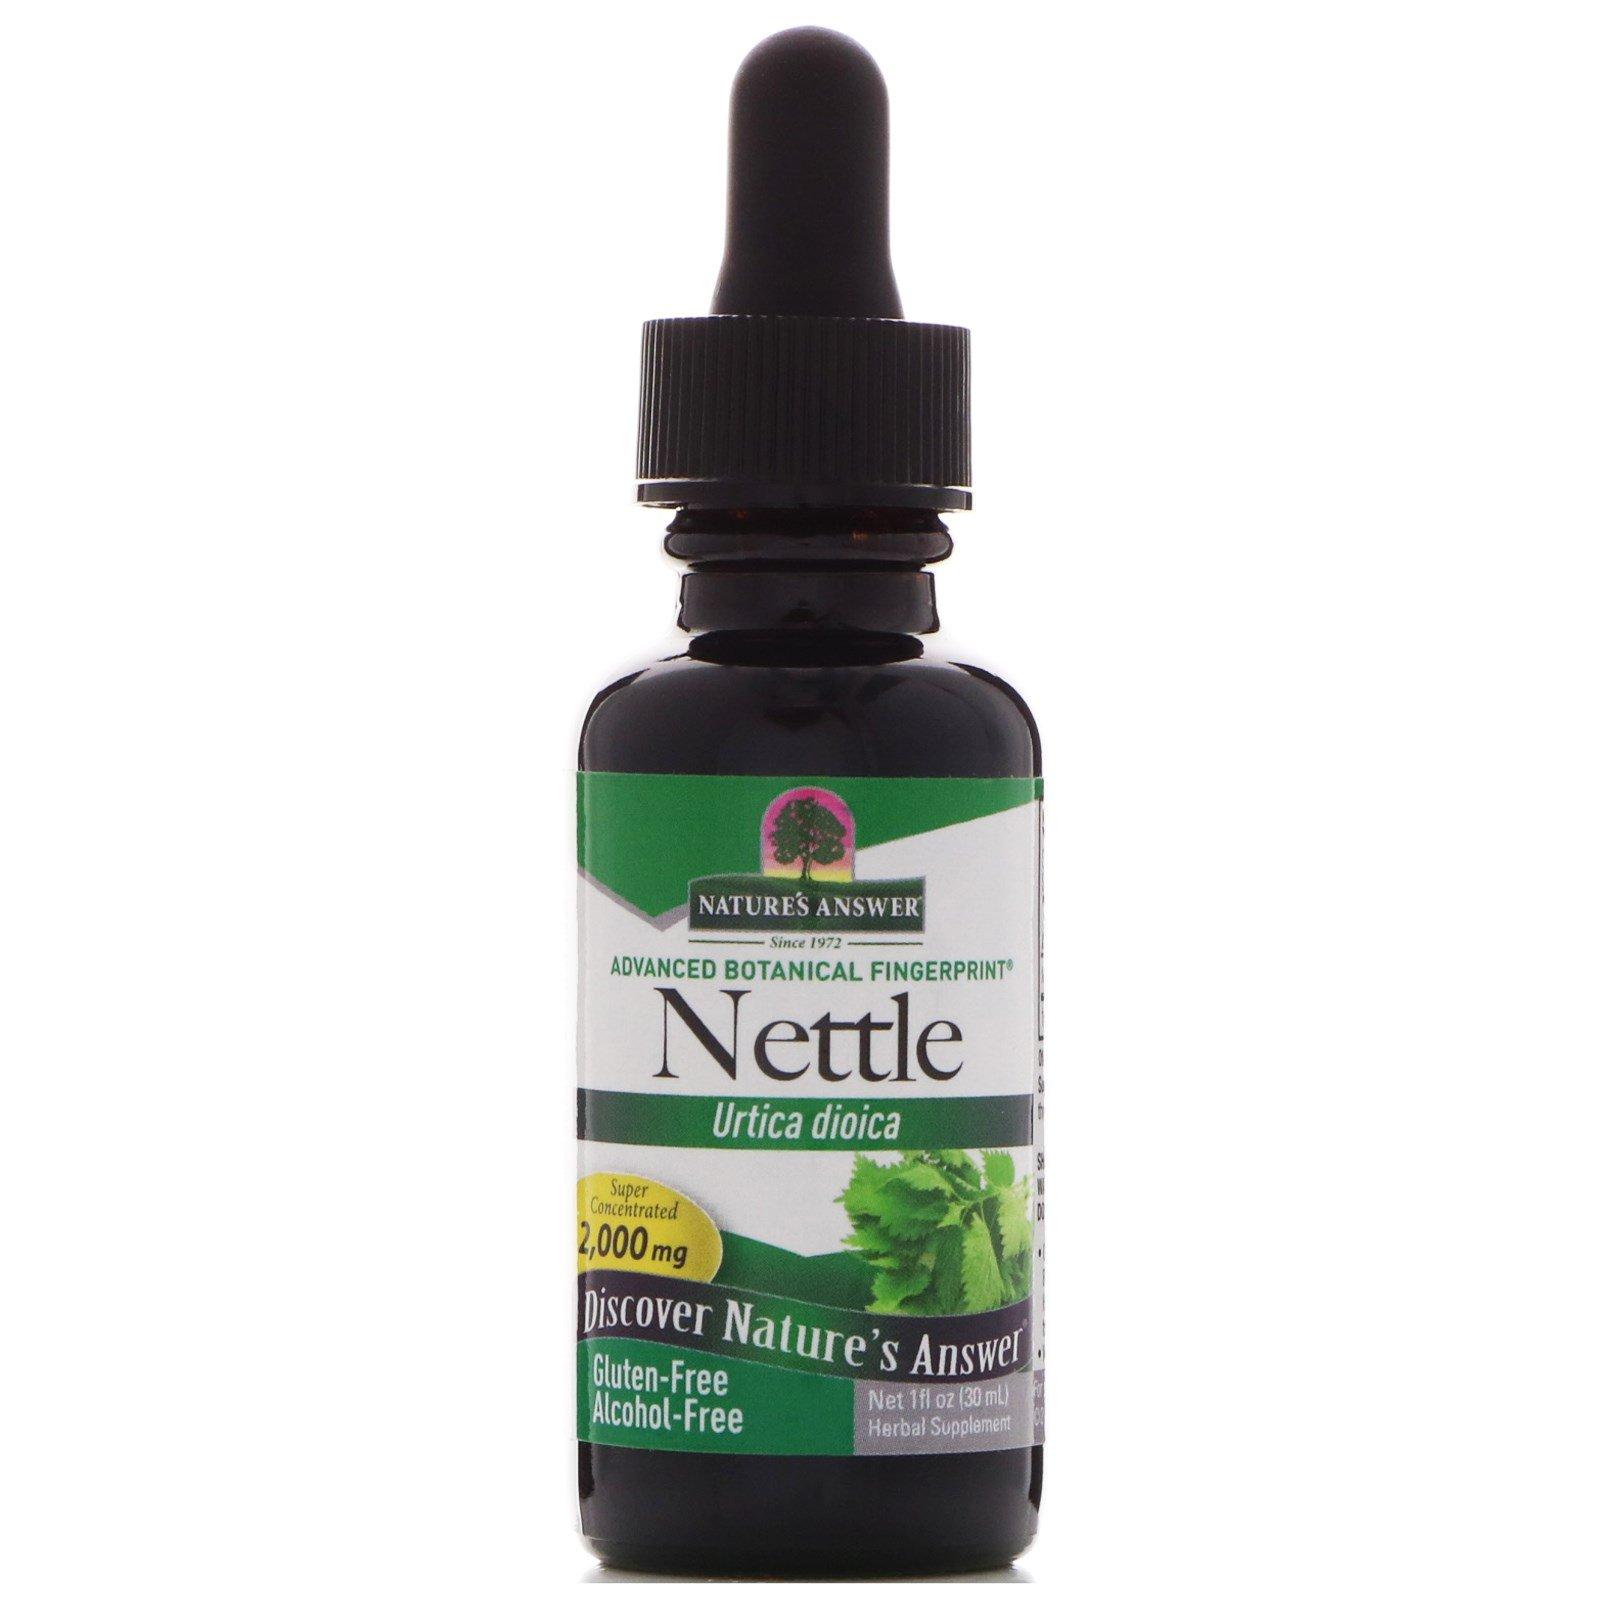 Nature's Answer, Крапива двудомная (Urtica Dioica), 2000 мг, 1 жидкая унция (30 мл)